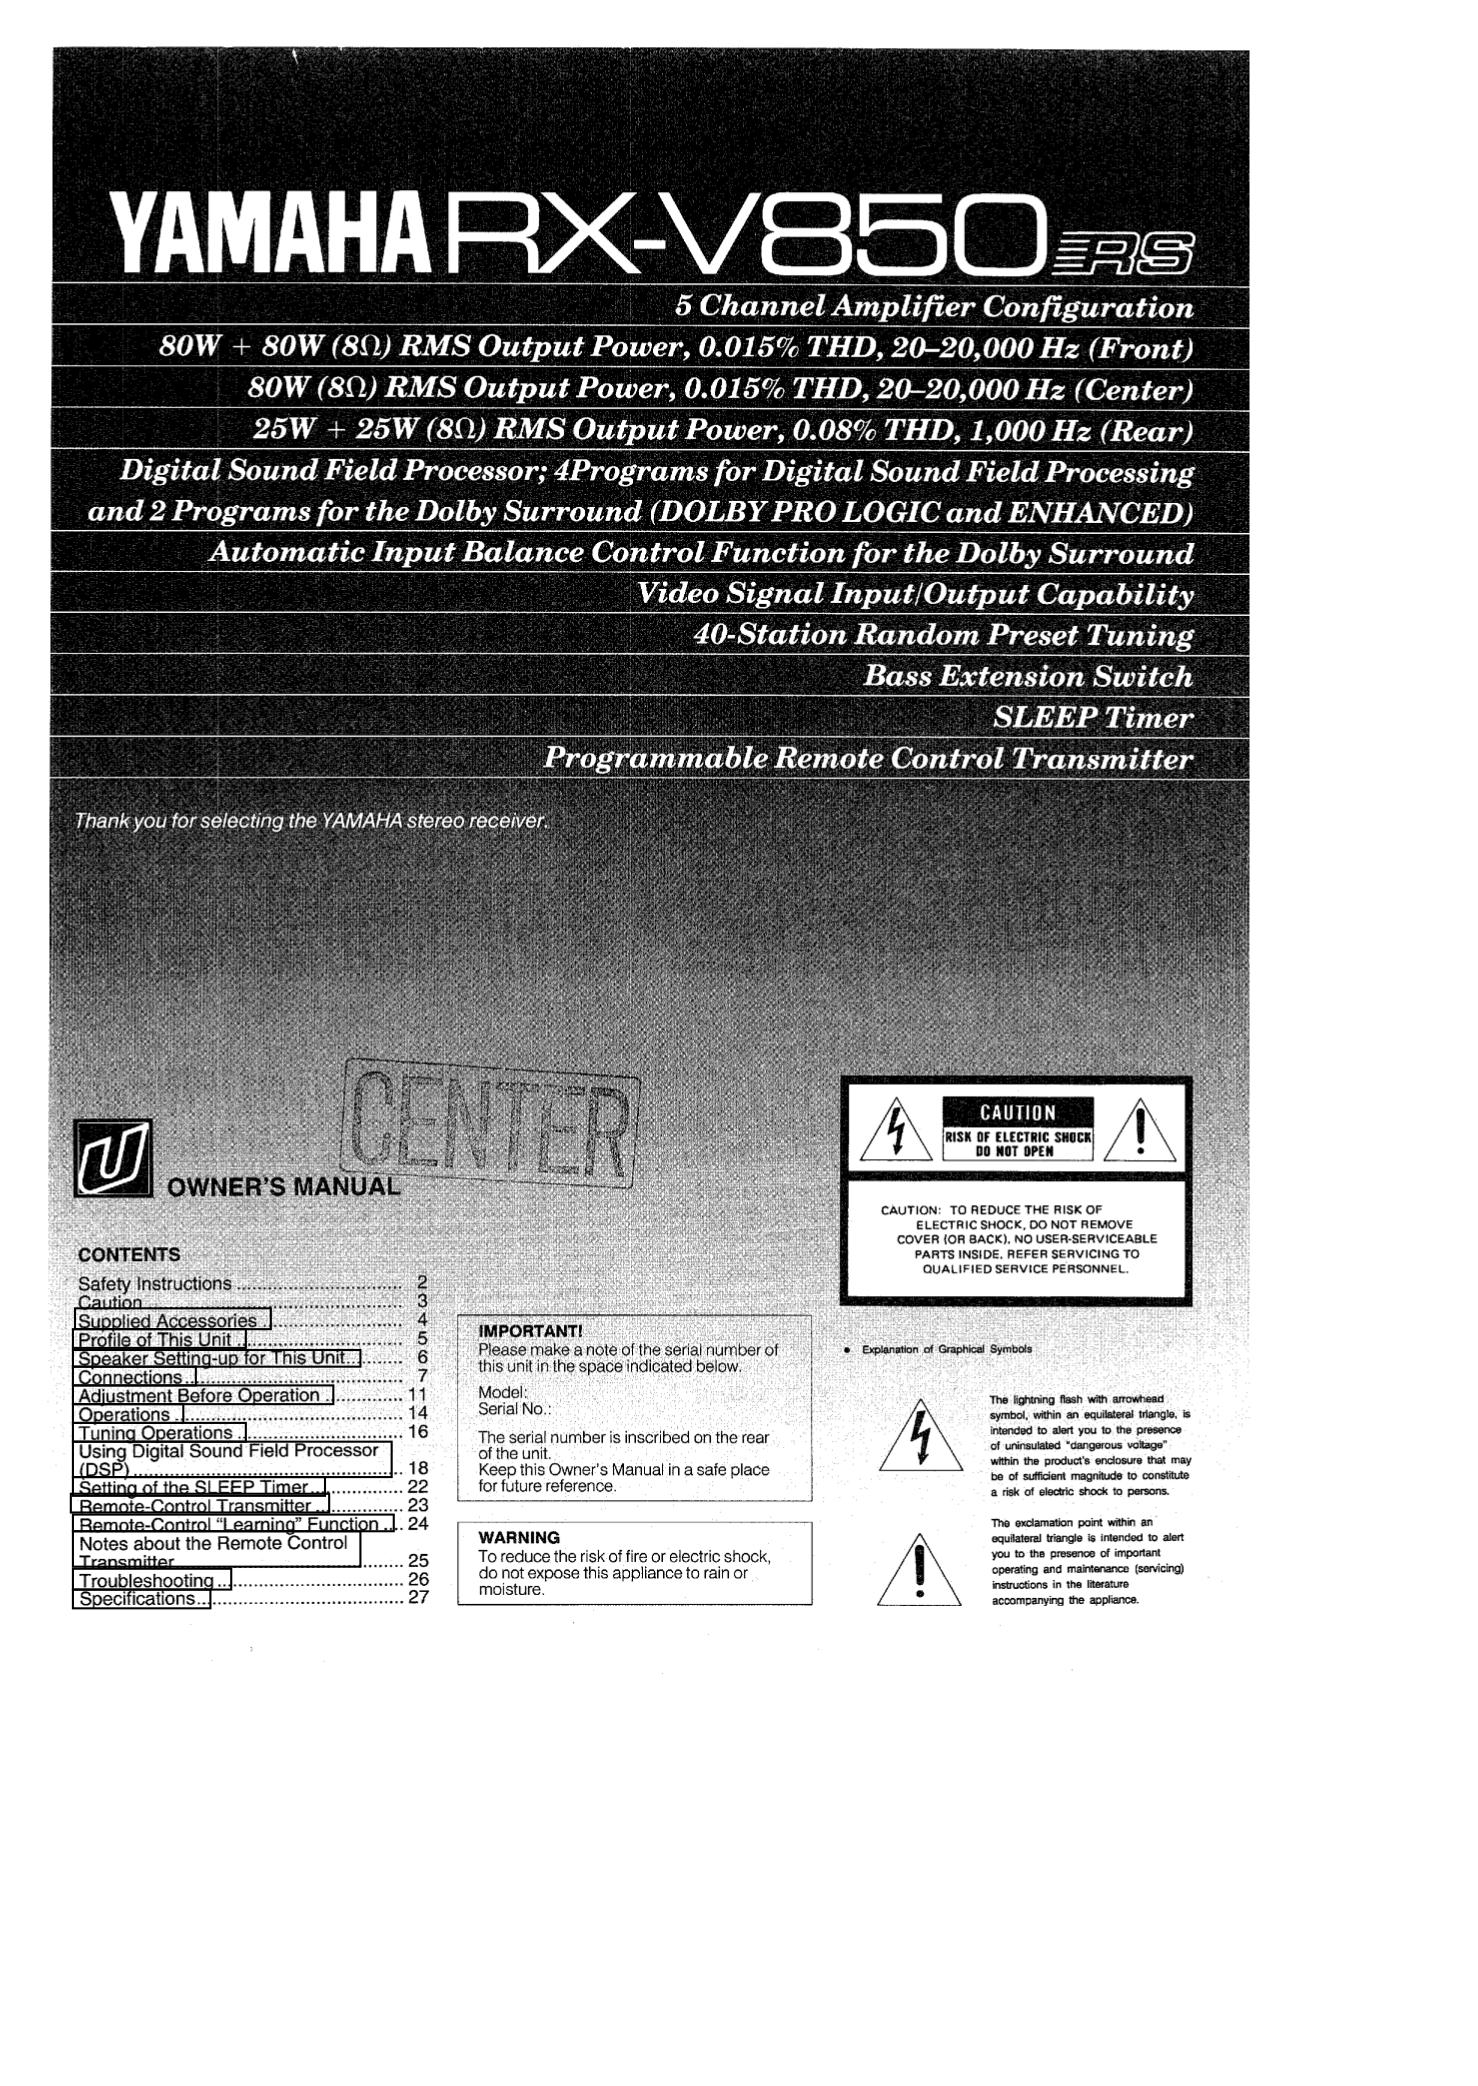 Yamaha rx-v870 manuals.